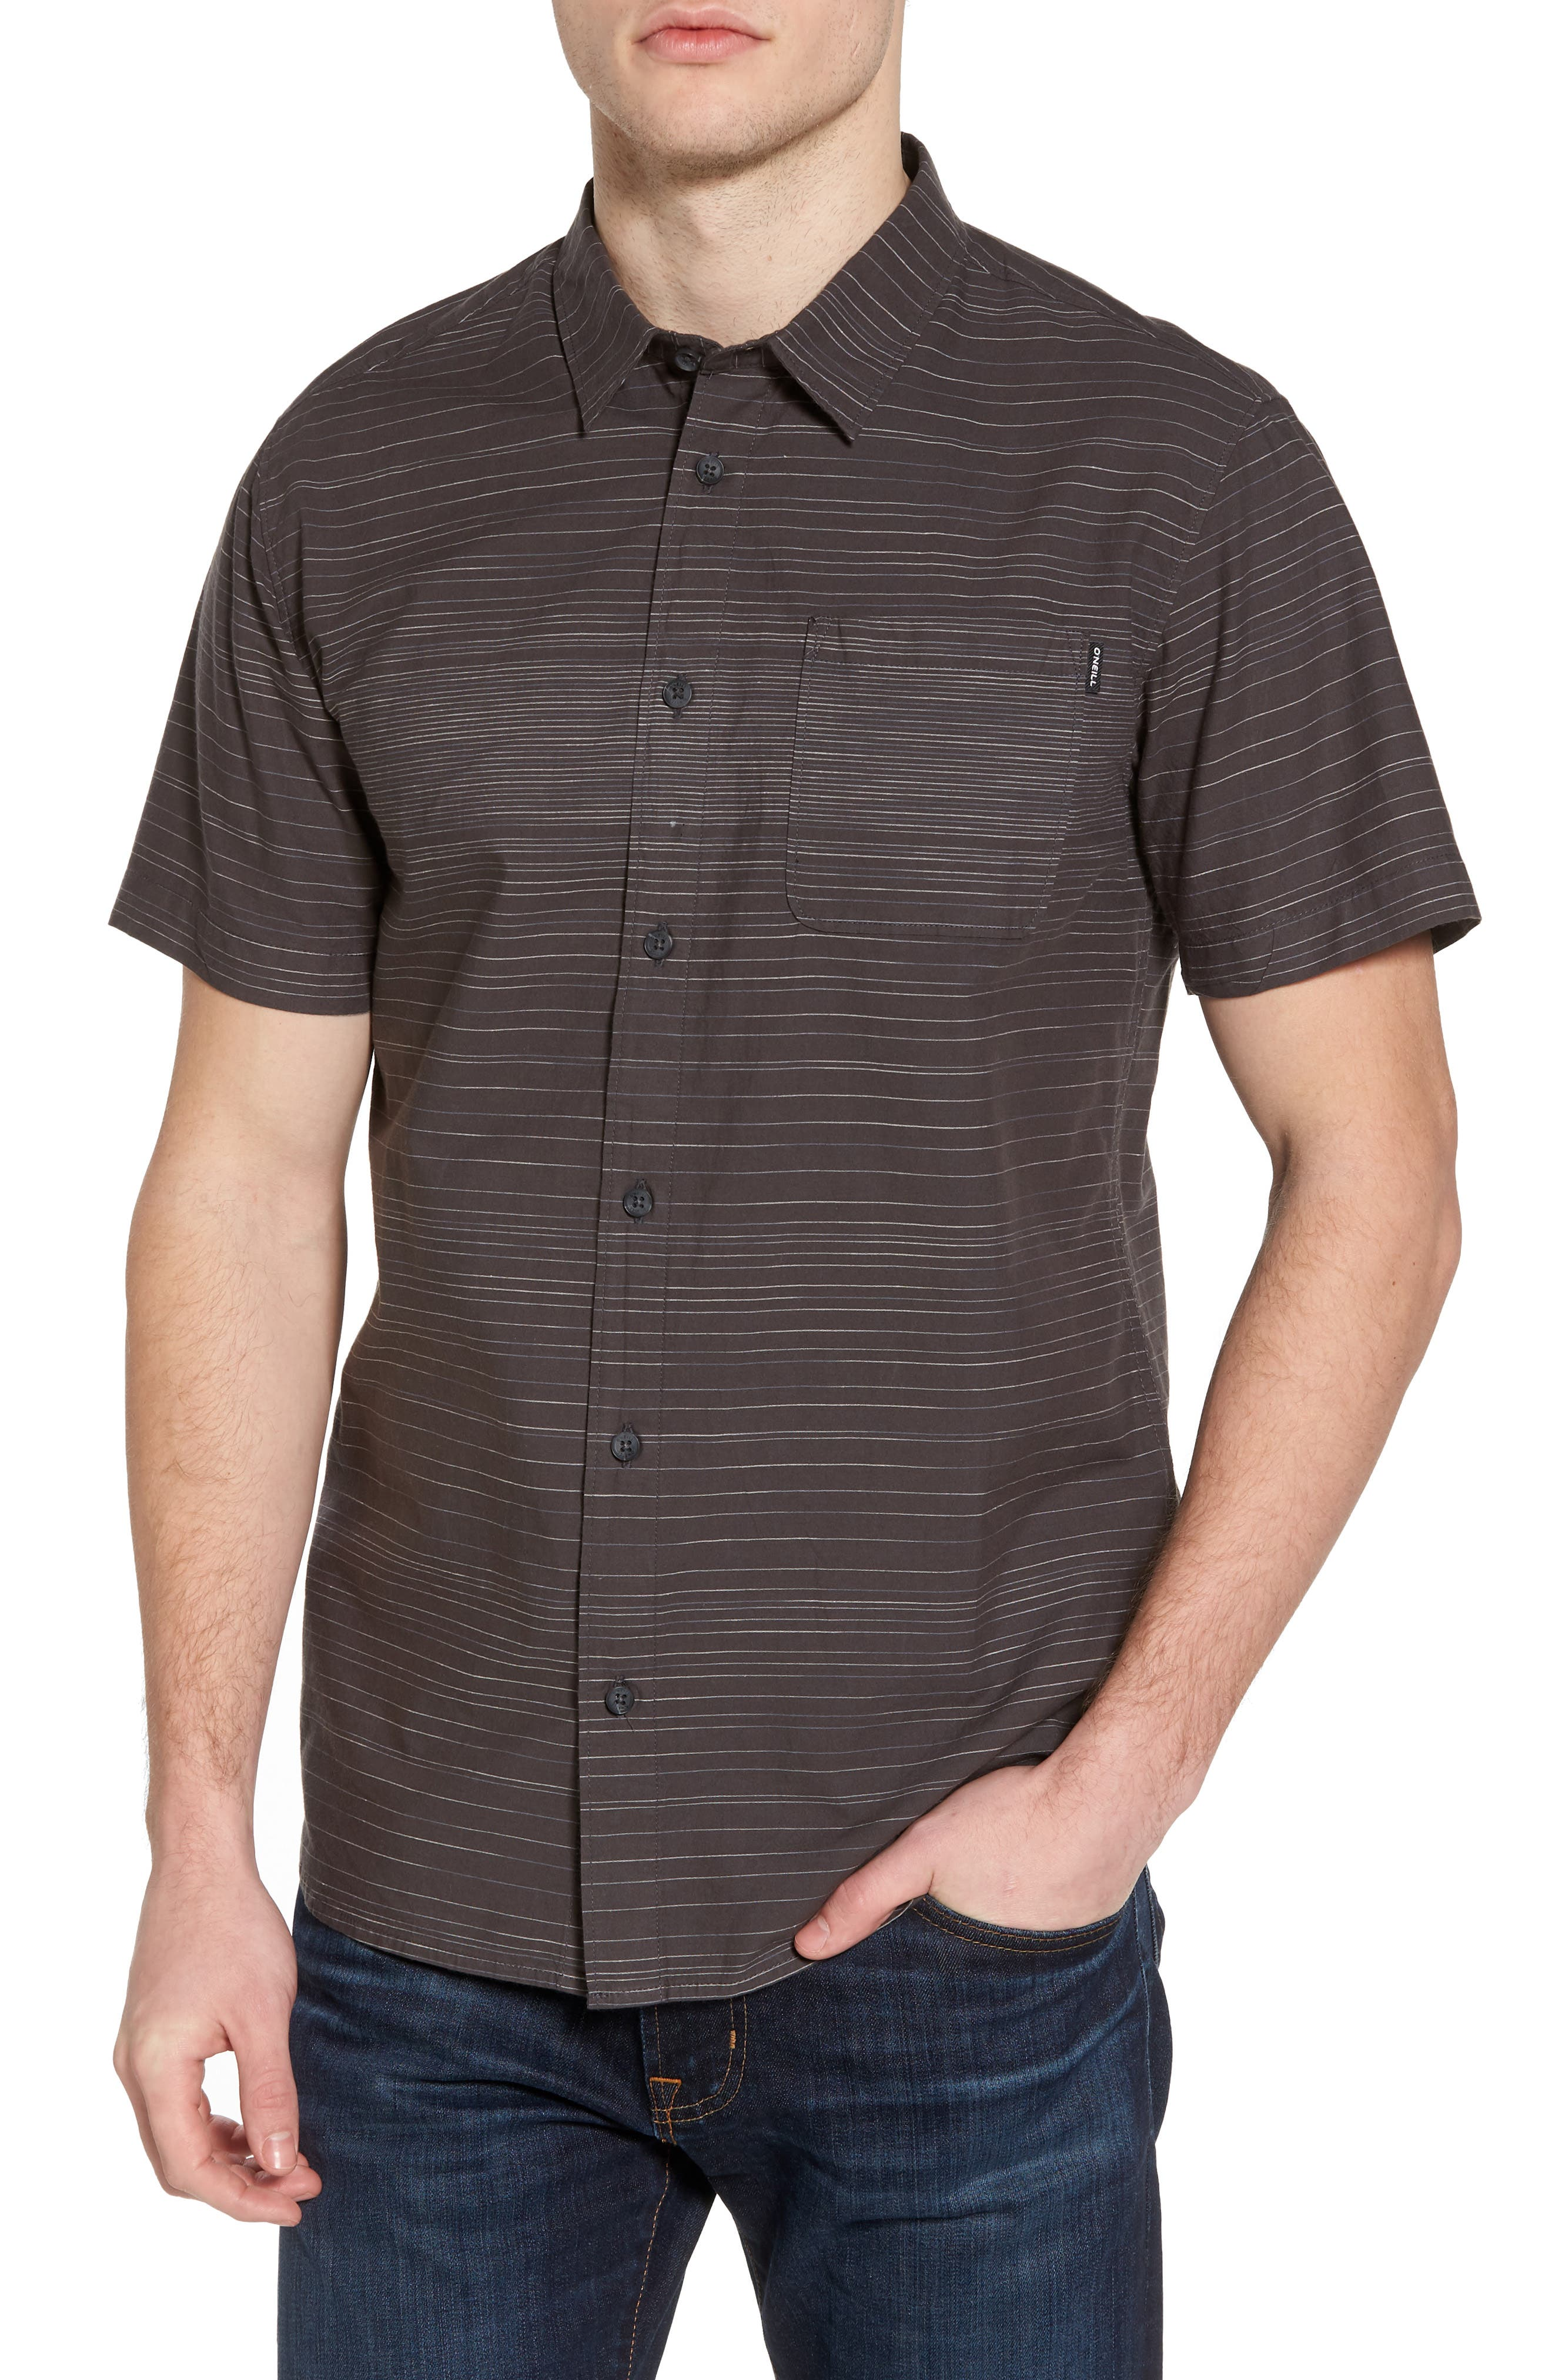 Hound Woven Shirt,                         Main,                         color, Asphalt